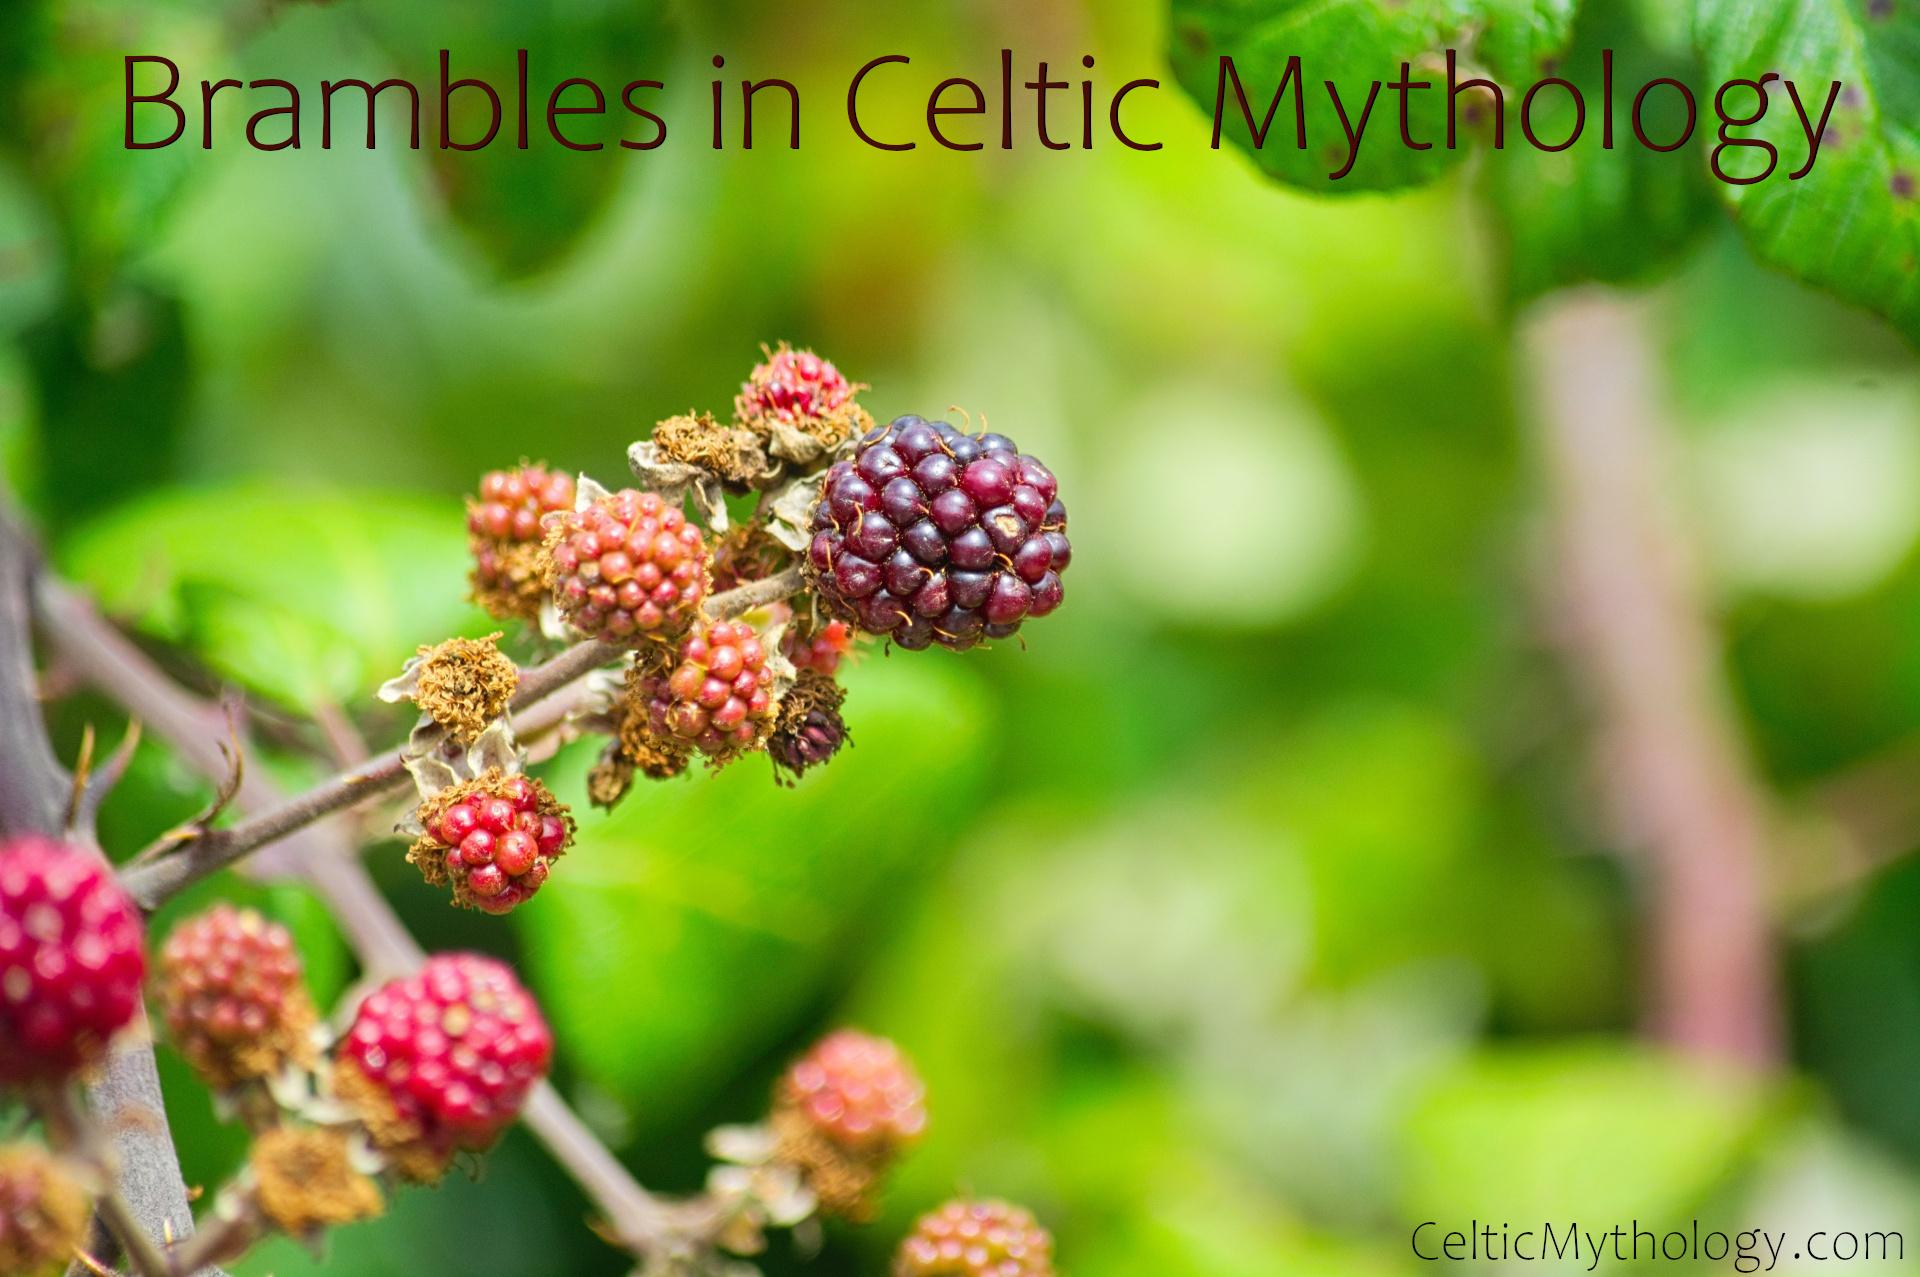 Brambles in Celtic Mythology